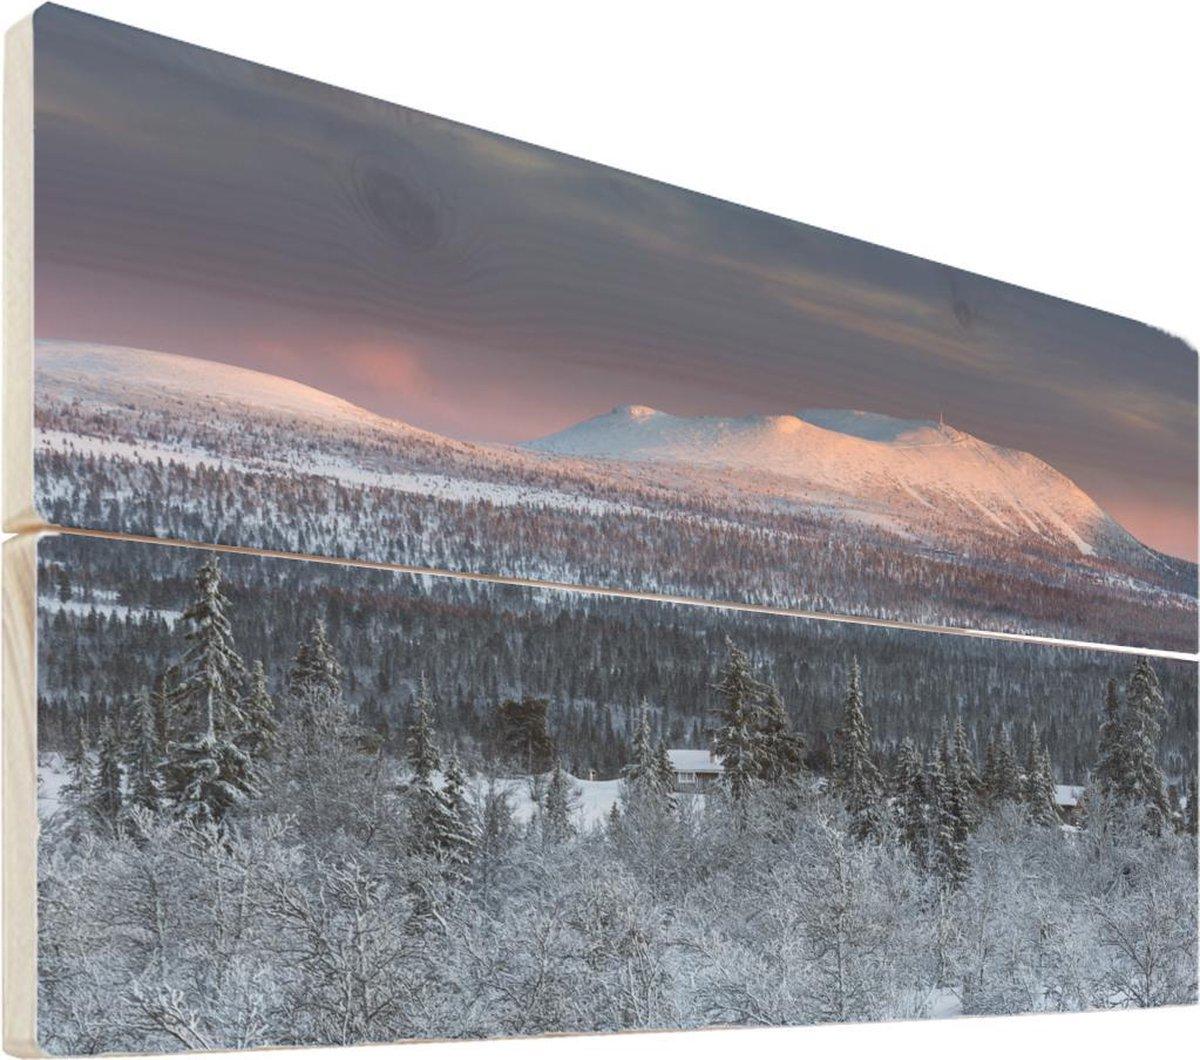 Bergen op hout - 30x20 - Winters berglandschap Hout - foto/schilderij op hout